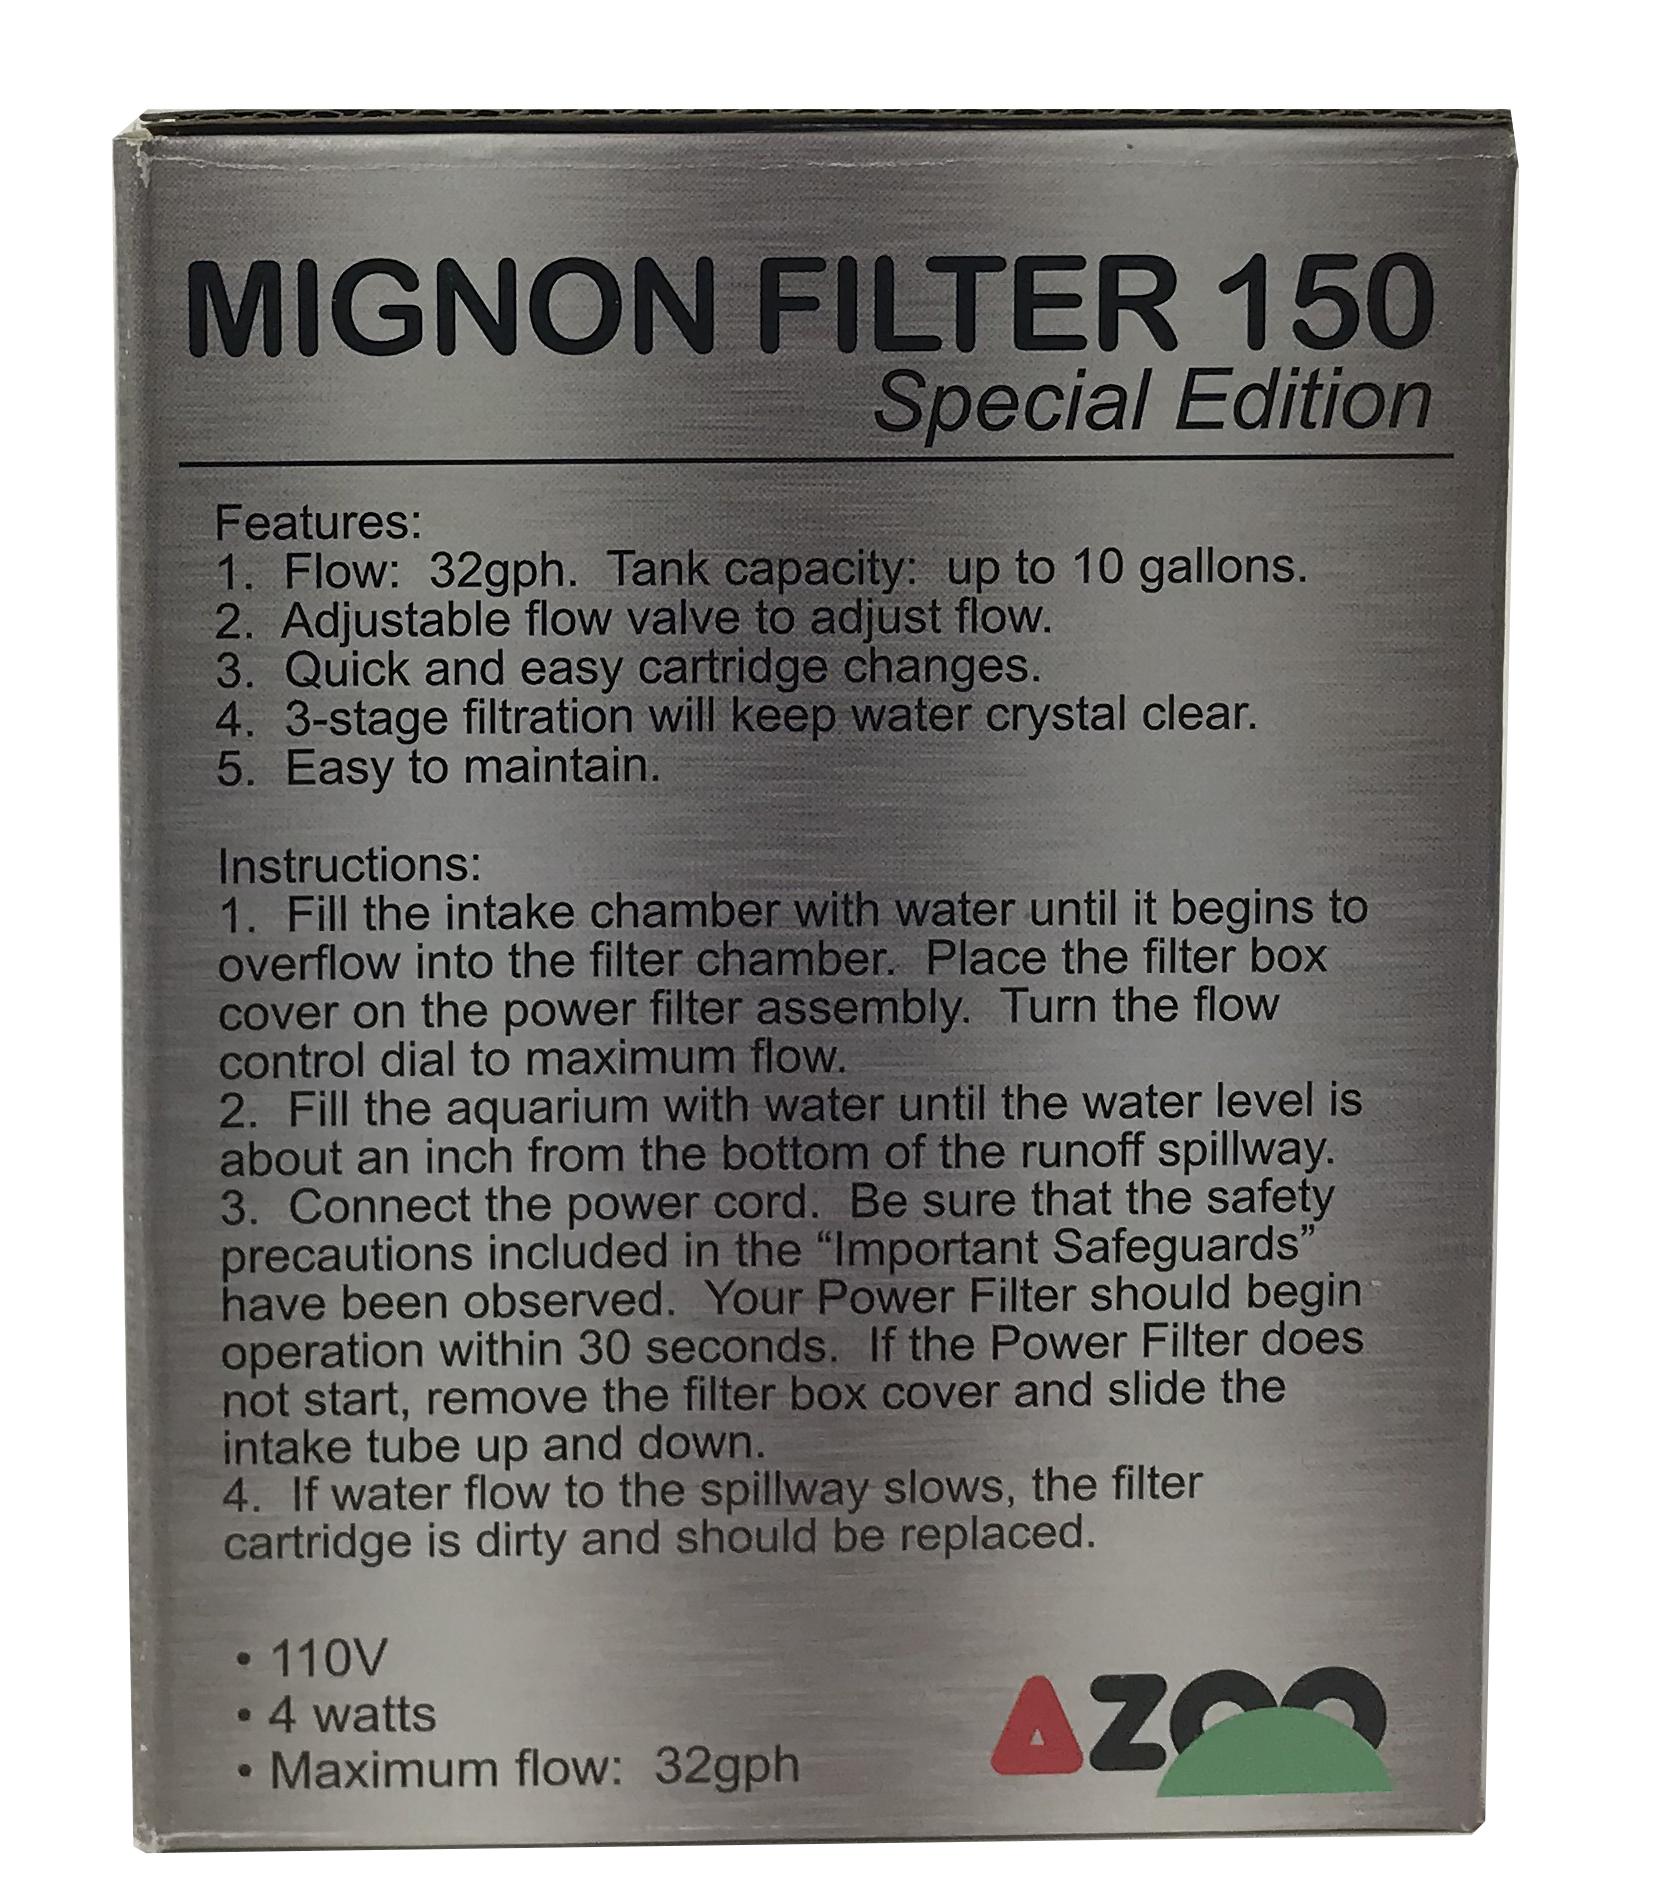 Mignon Filter 150 Special Edition - 40 GPH